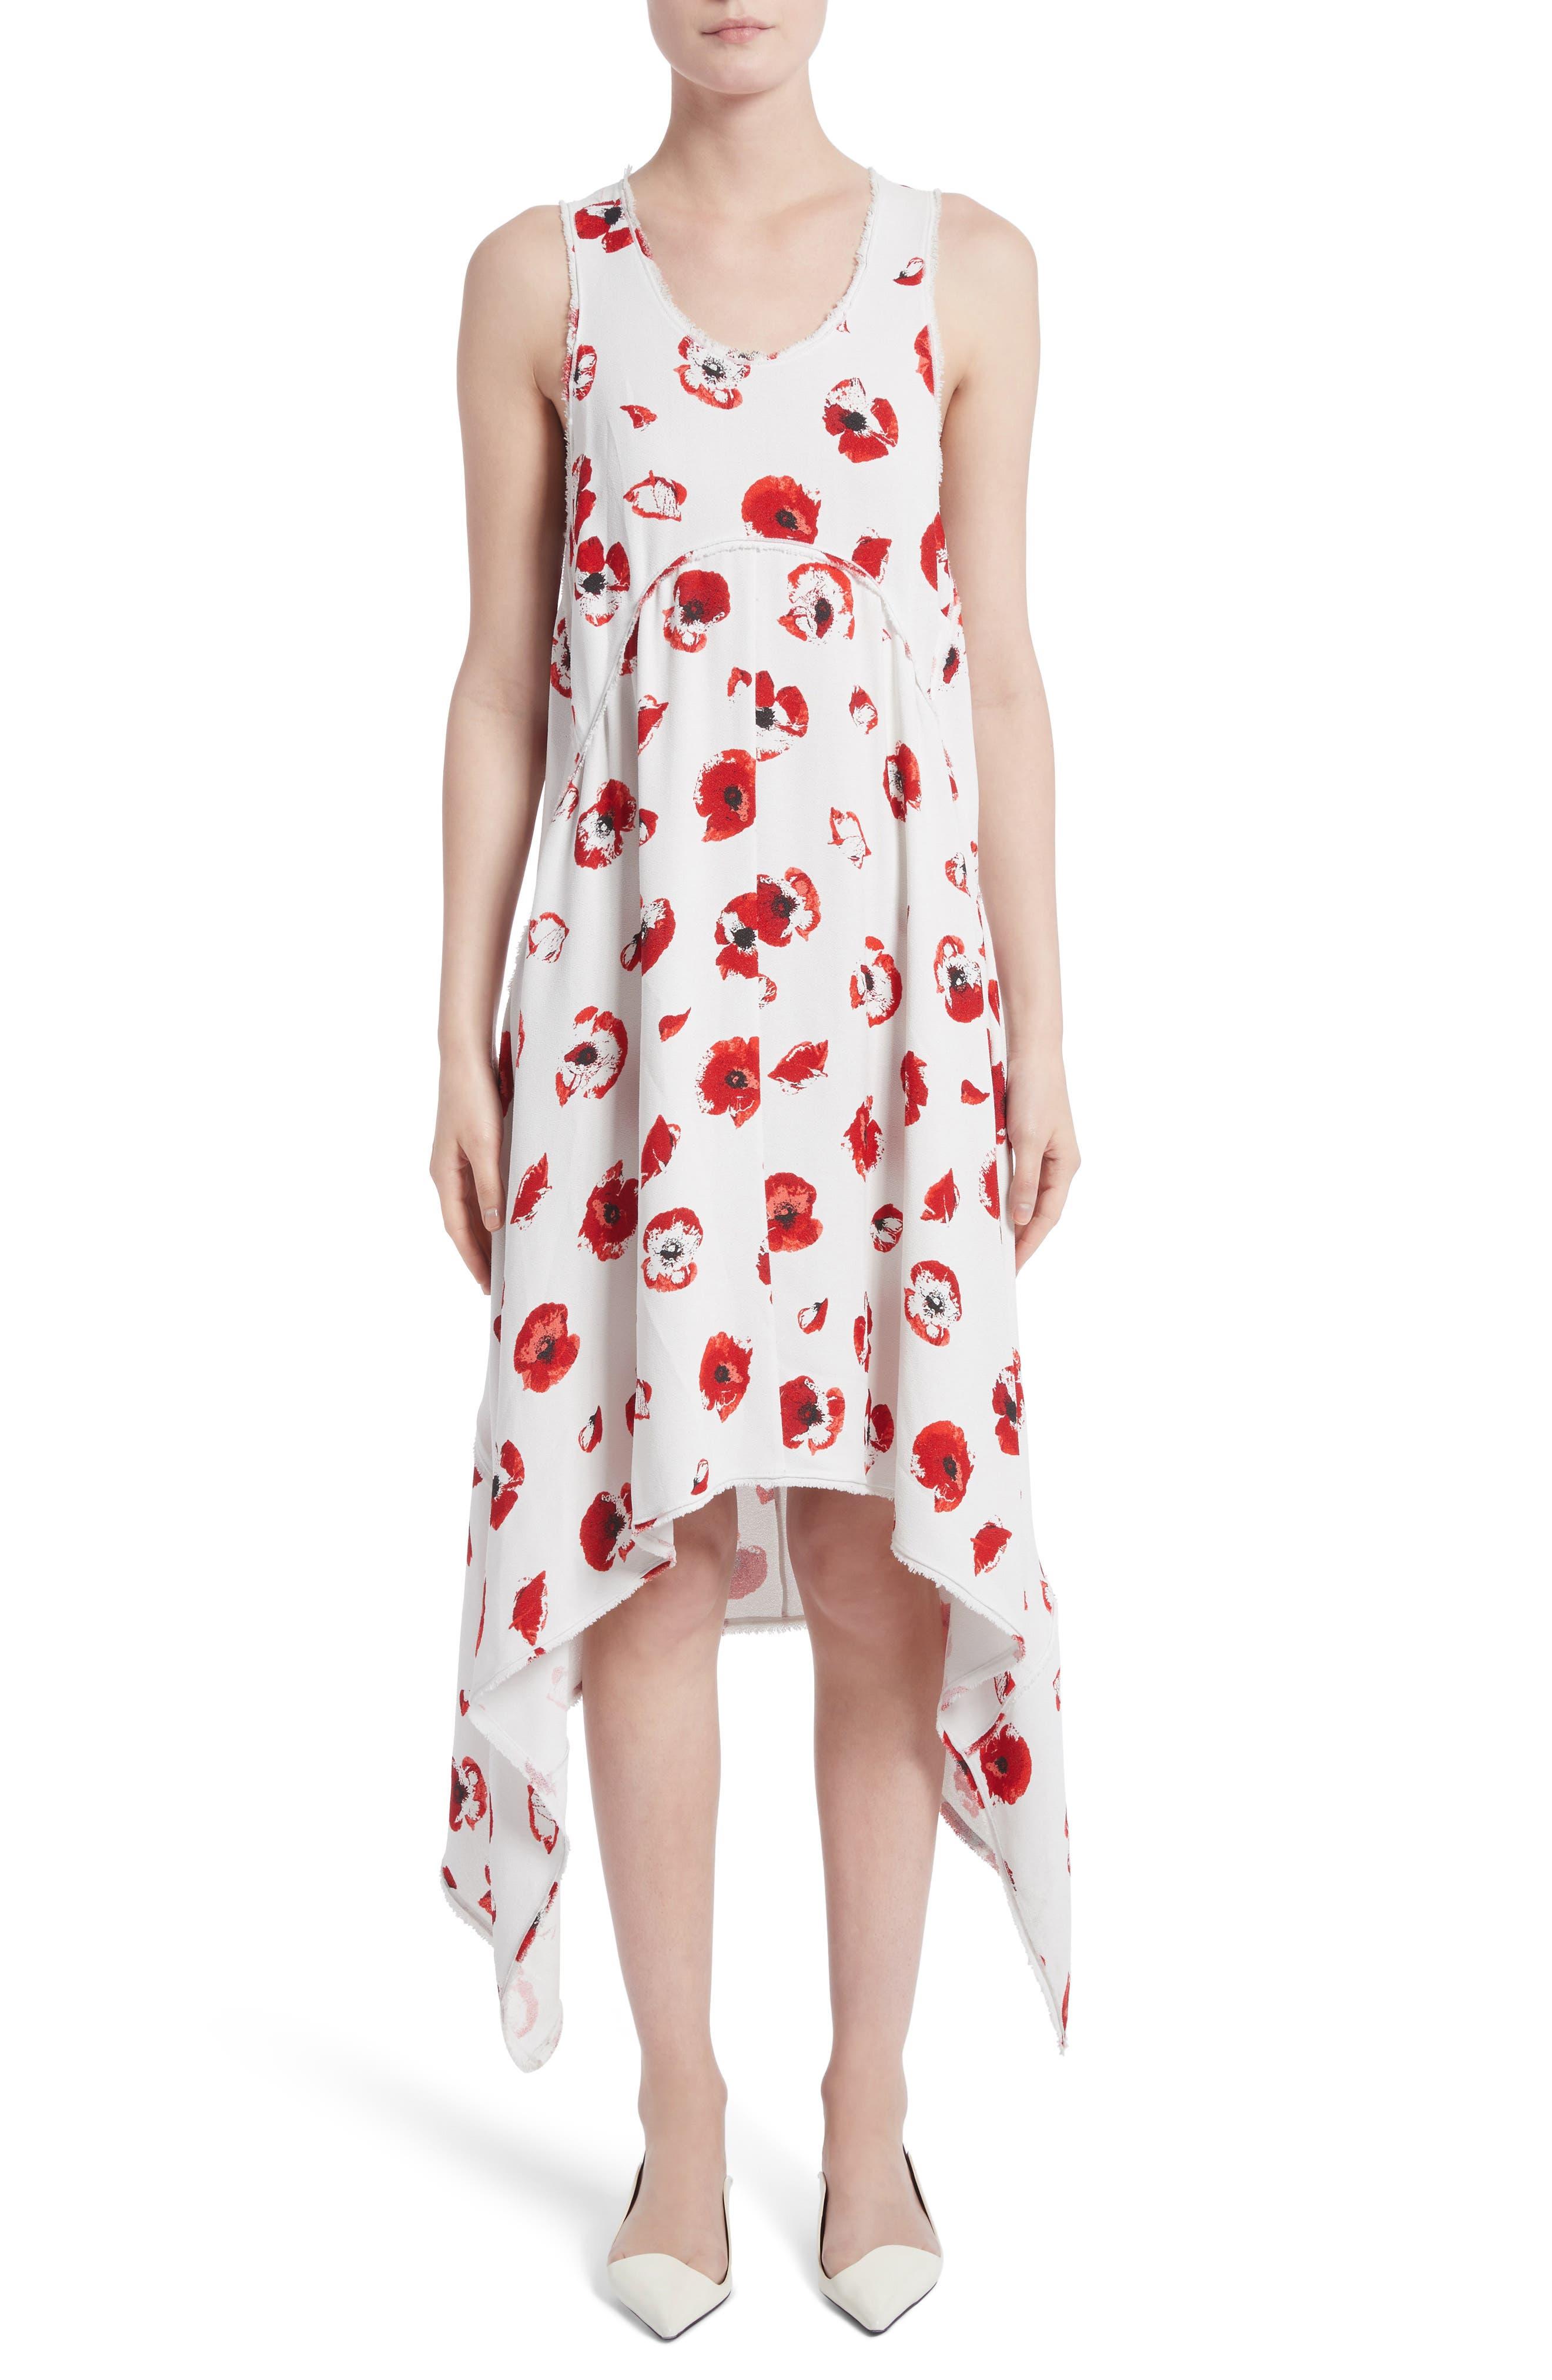 Alternate Image 1 Selected - Proenza Schouler Floral Print Handkerchief Hem Dress